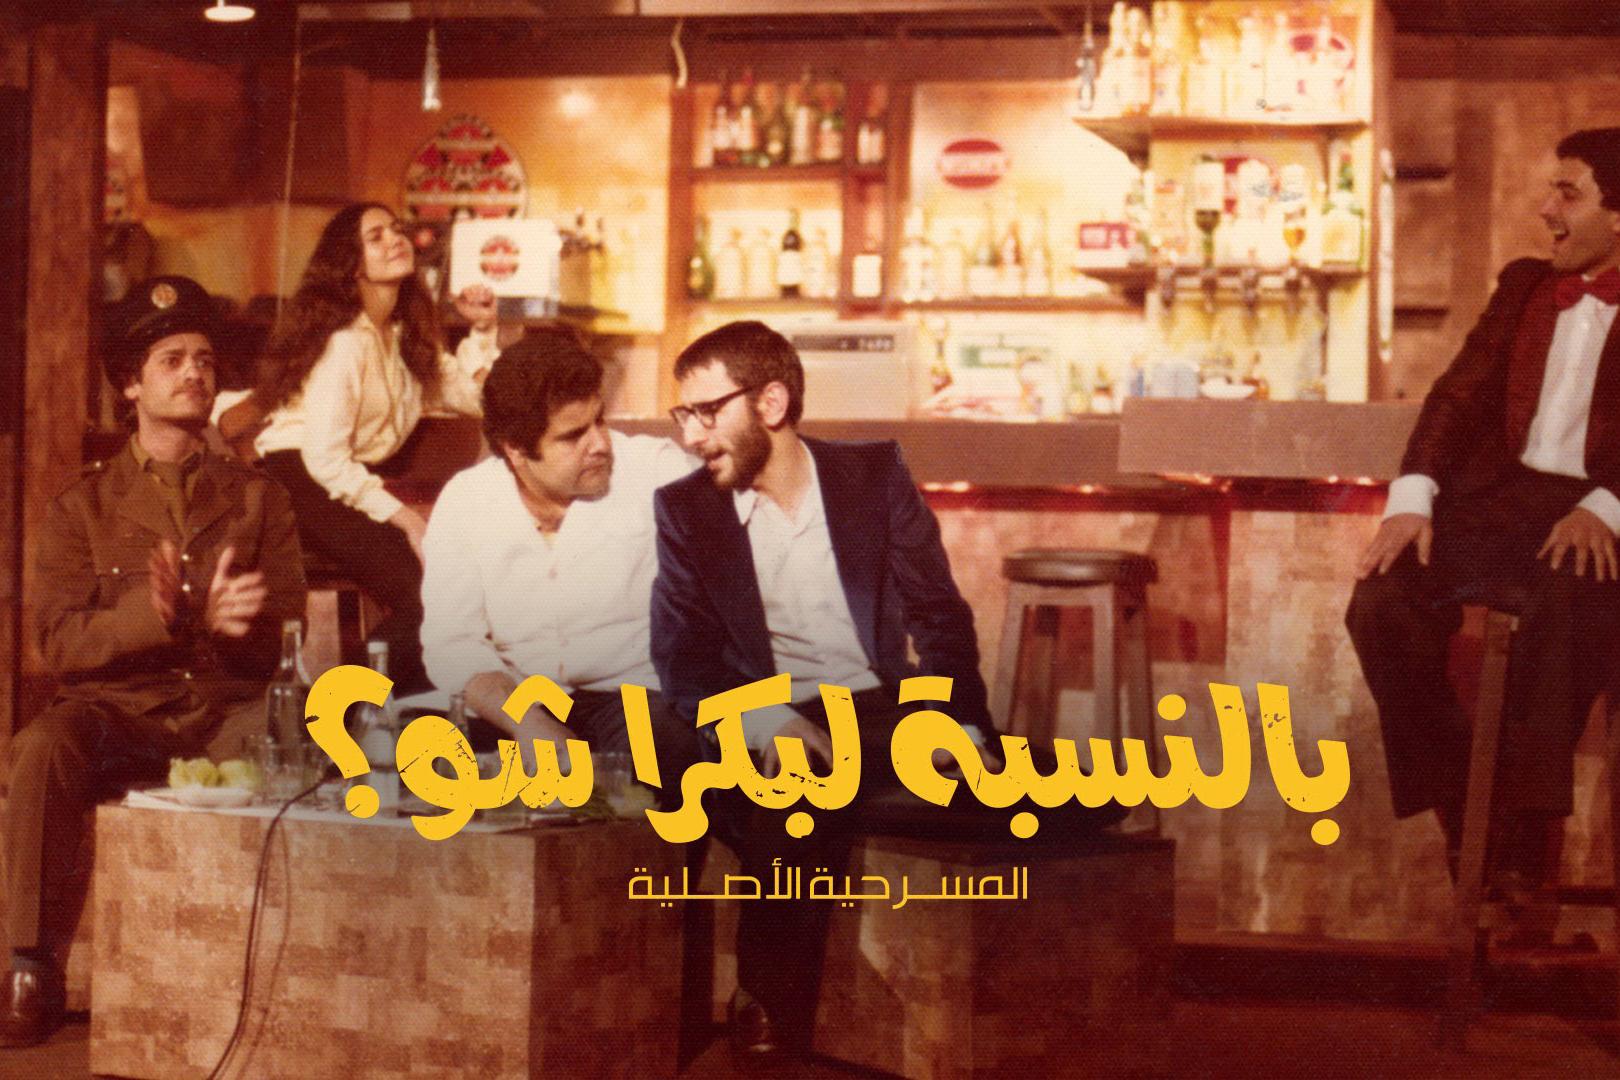 Ziad Rahbani Music, Lebanon